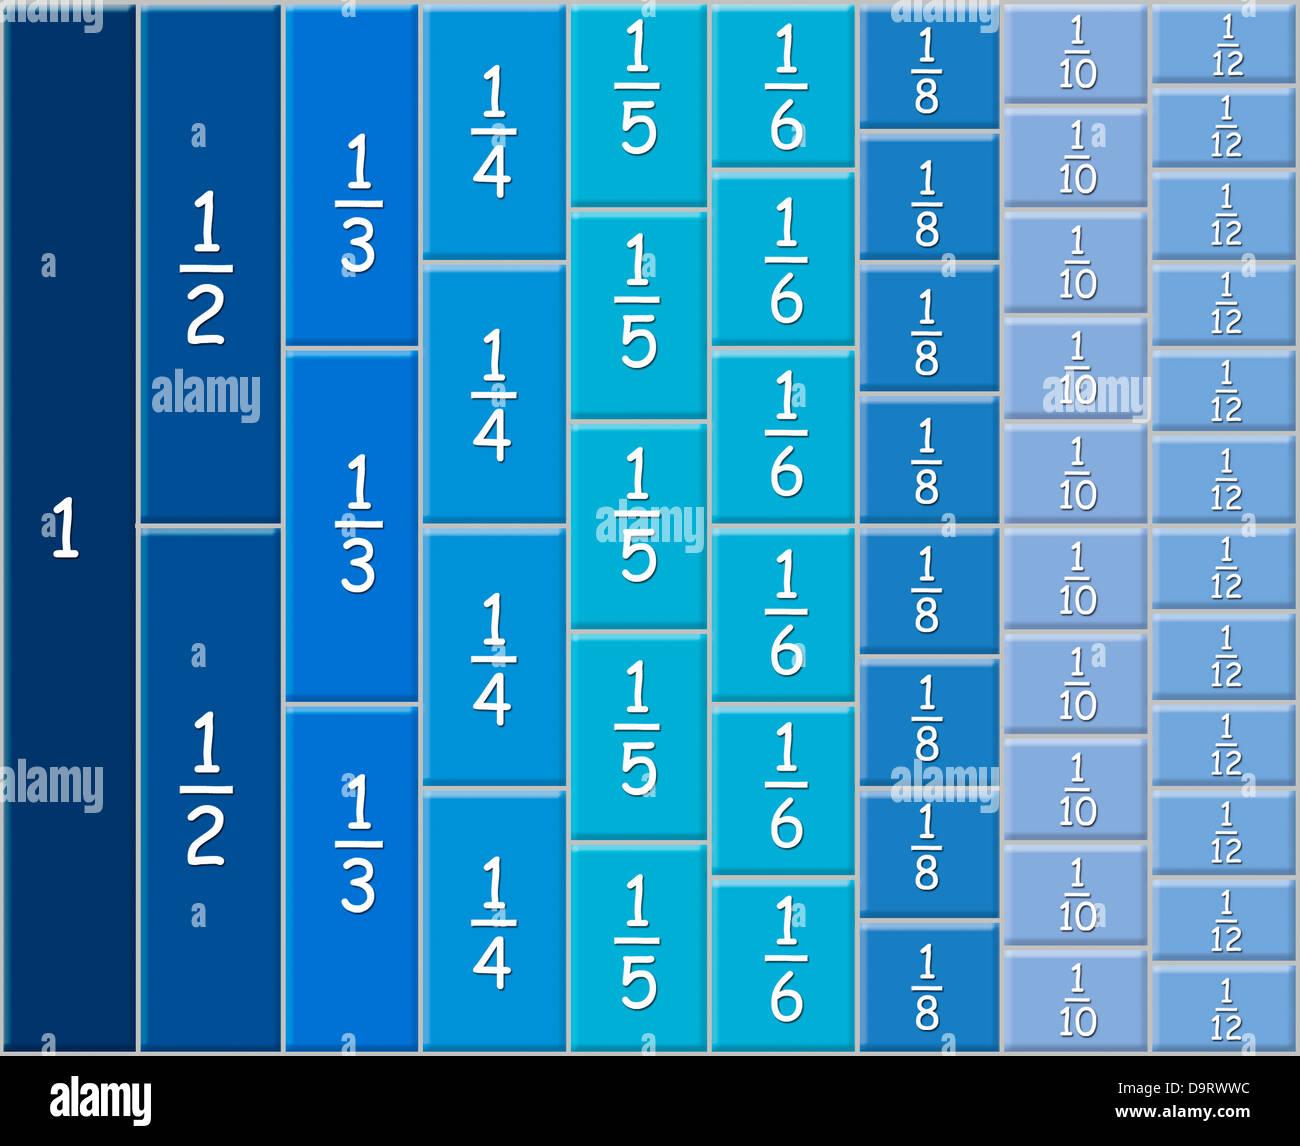 Math Aid Stock Photos & Math Aid Stock Images - Alamy